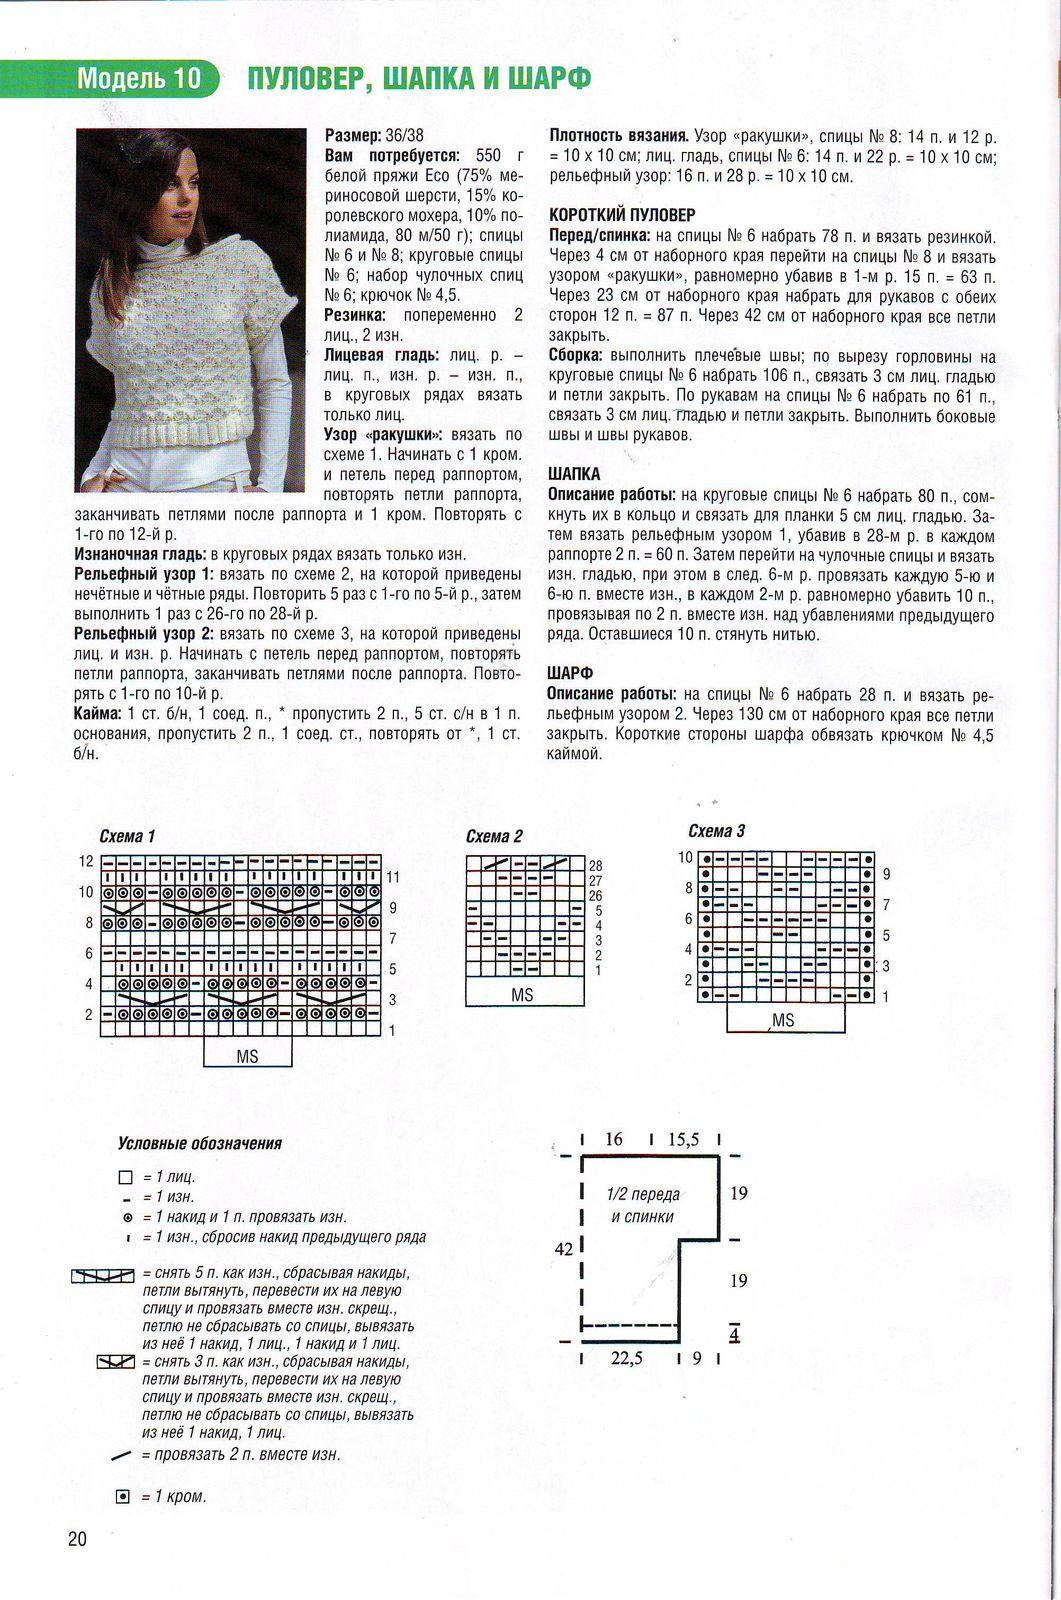 pulover s korotkim rukavom spicami 2 - Вязаный пуловер с коротким рукавом спицами